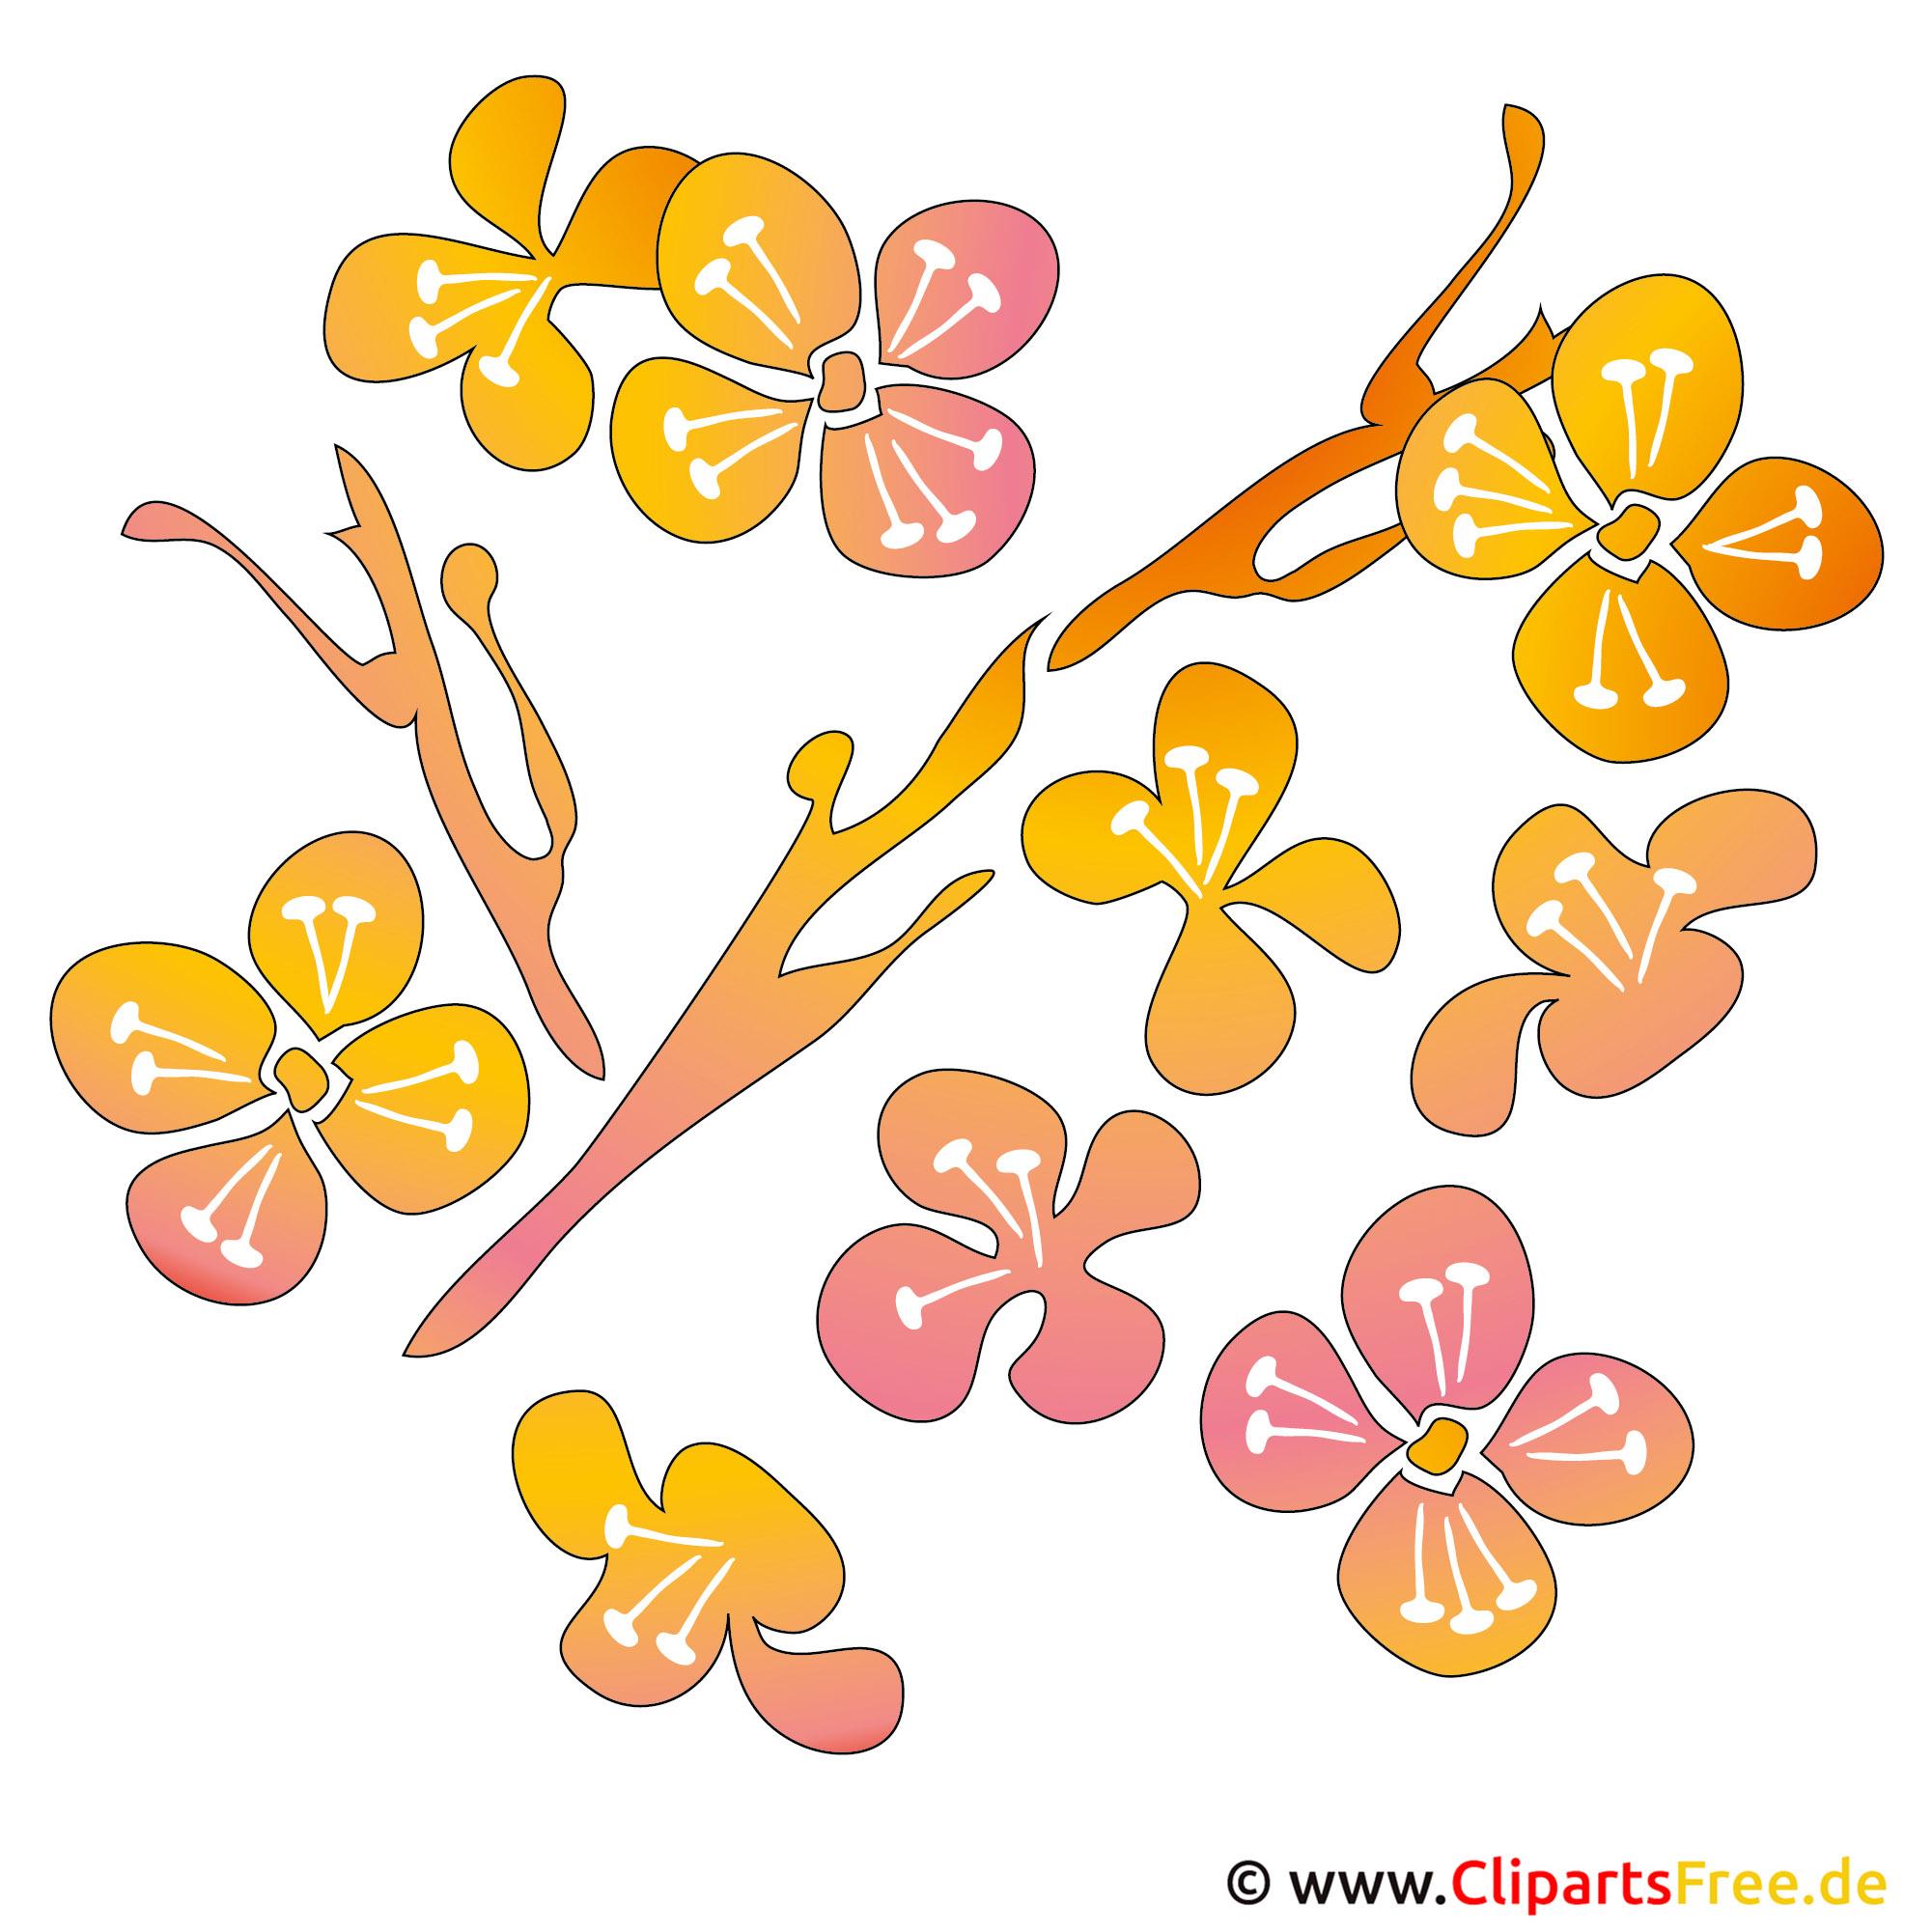 Frühling Cliparts kostenlos - Blumen